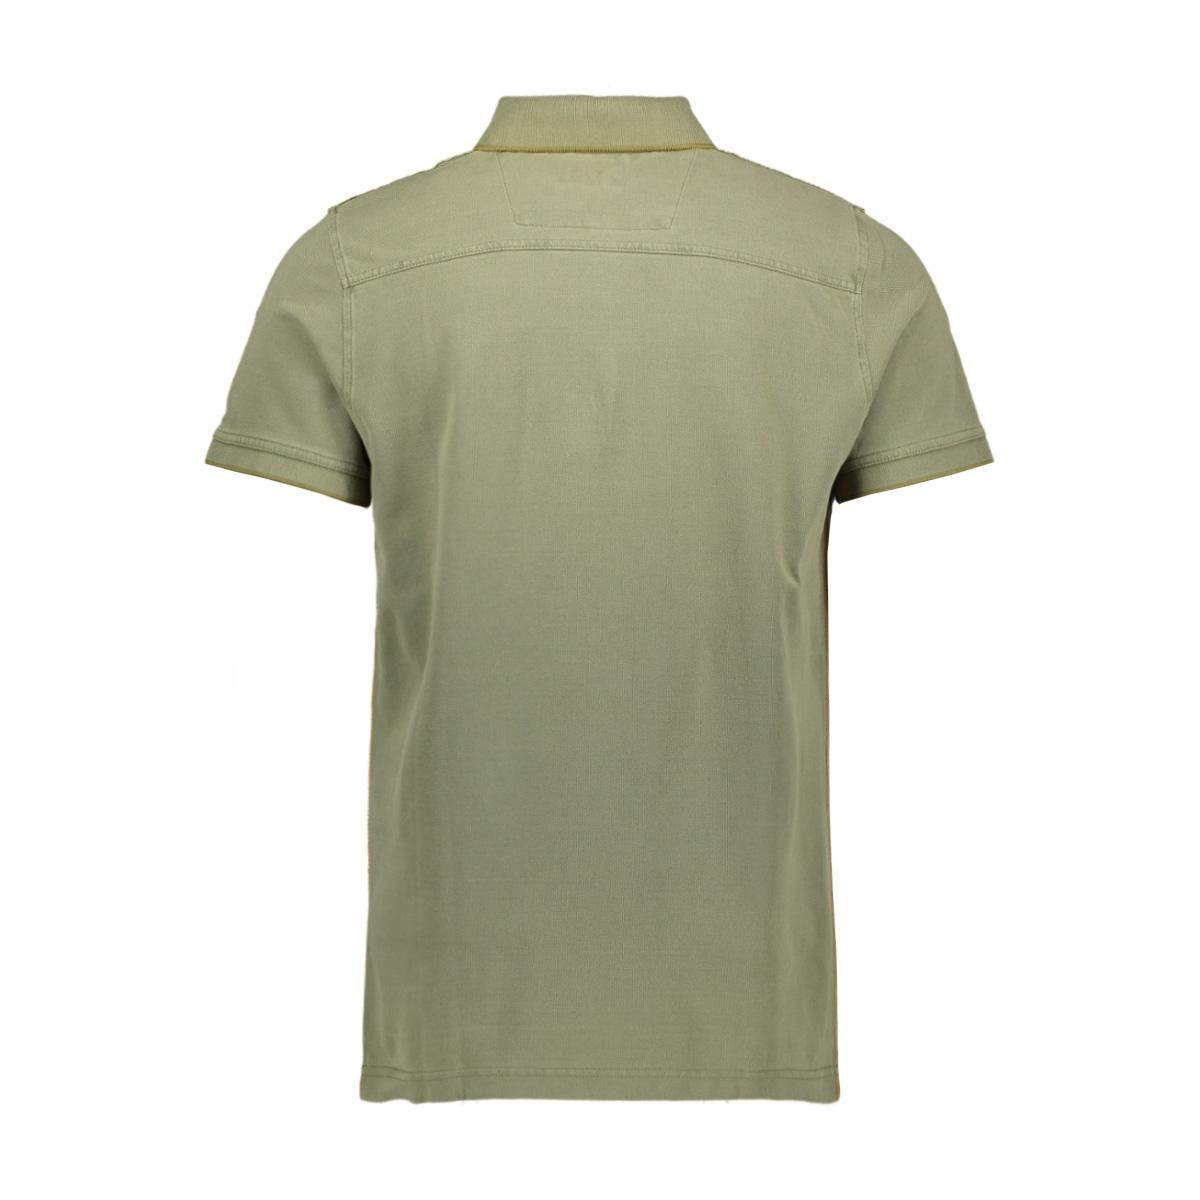 short sleeve polo ppss193850 pme legend polo 6414